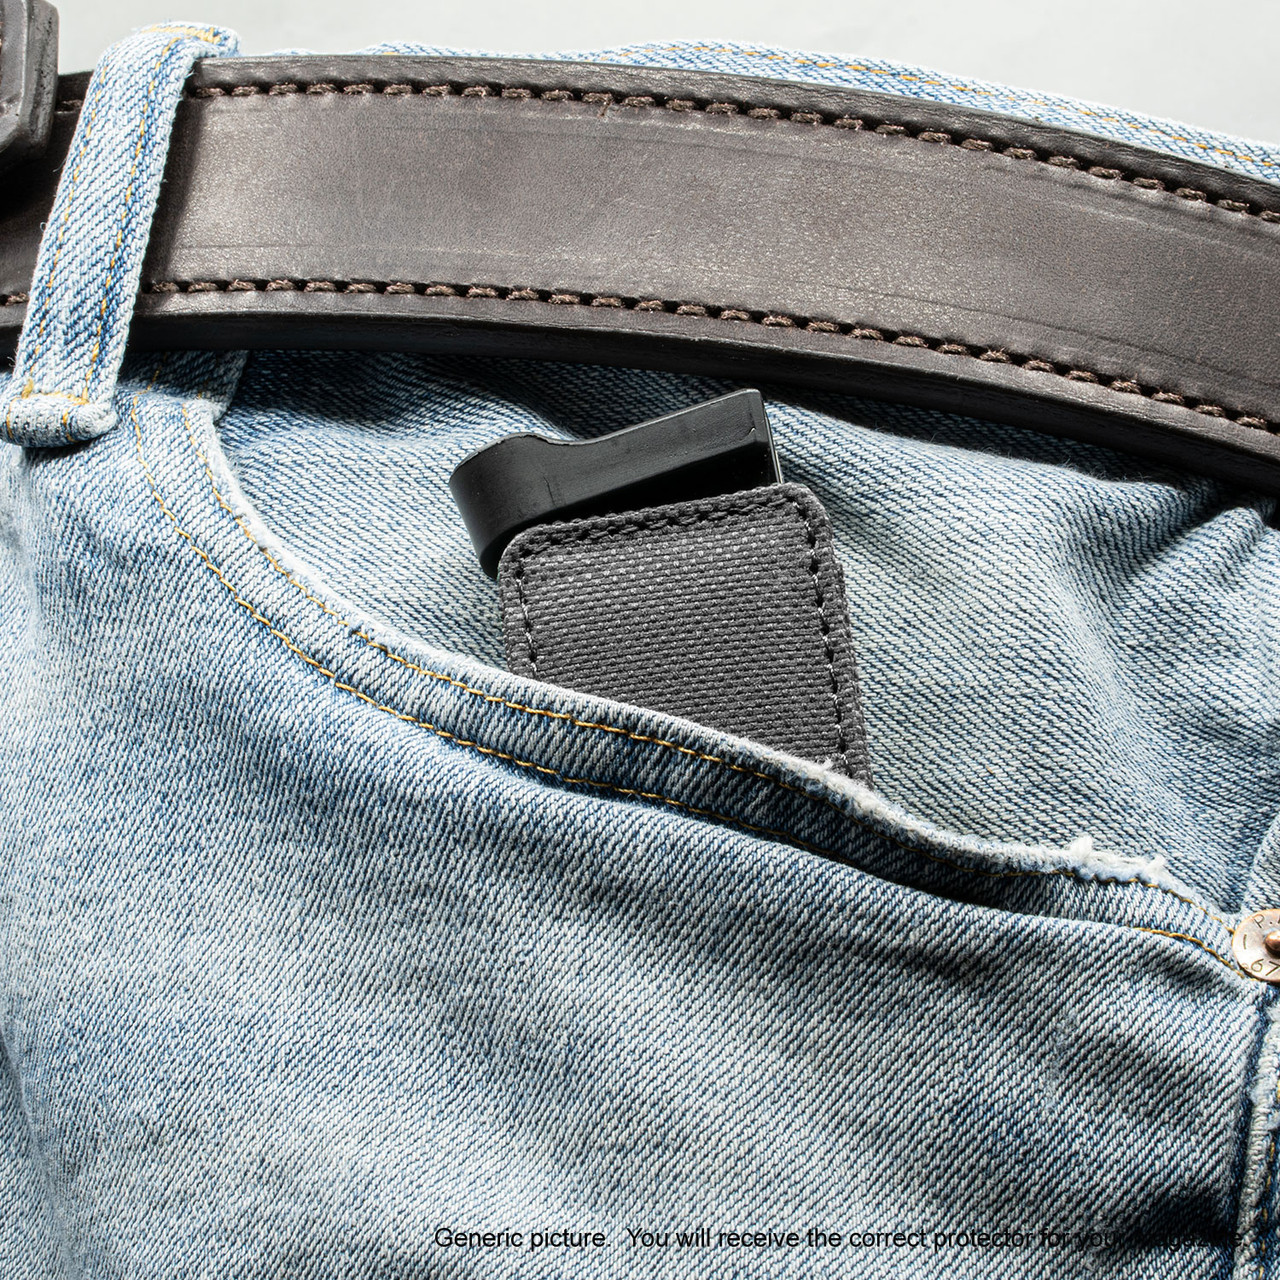 CZ 2075 Rami Grey Covert Magazine Pocket Protector